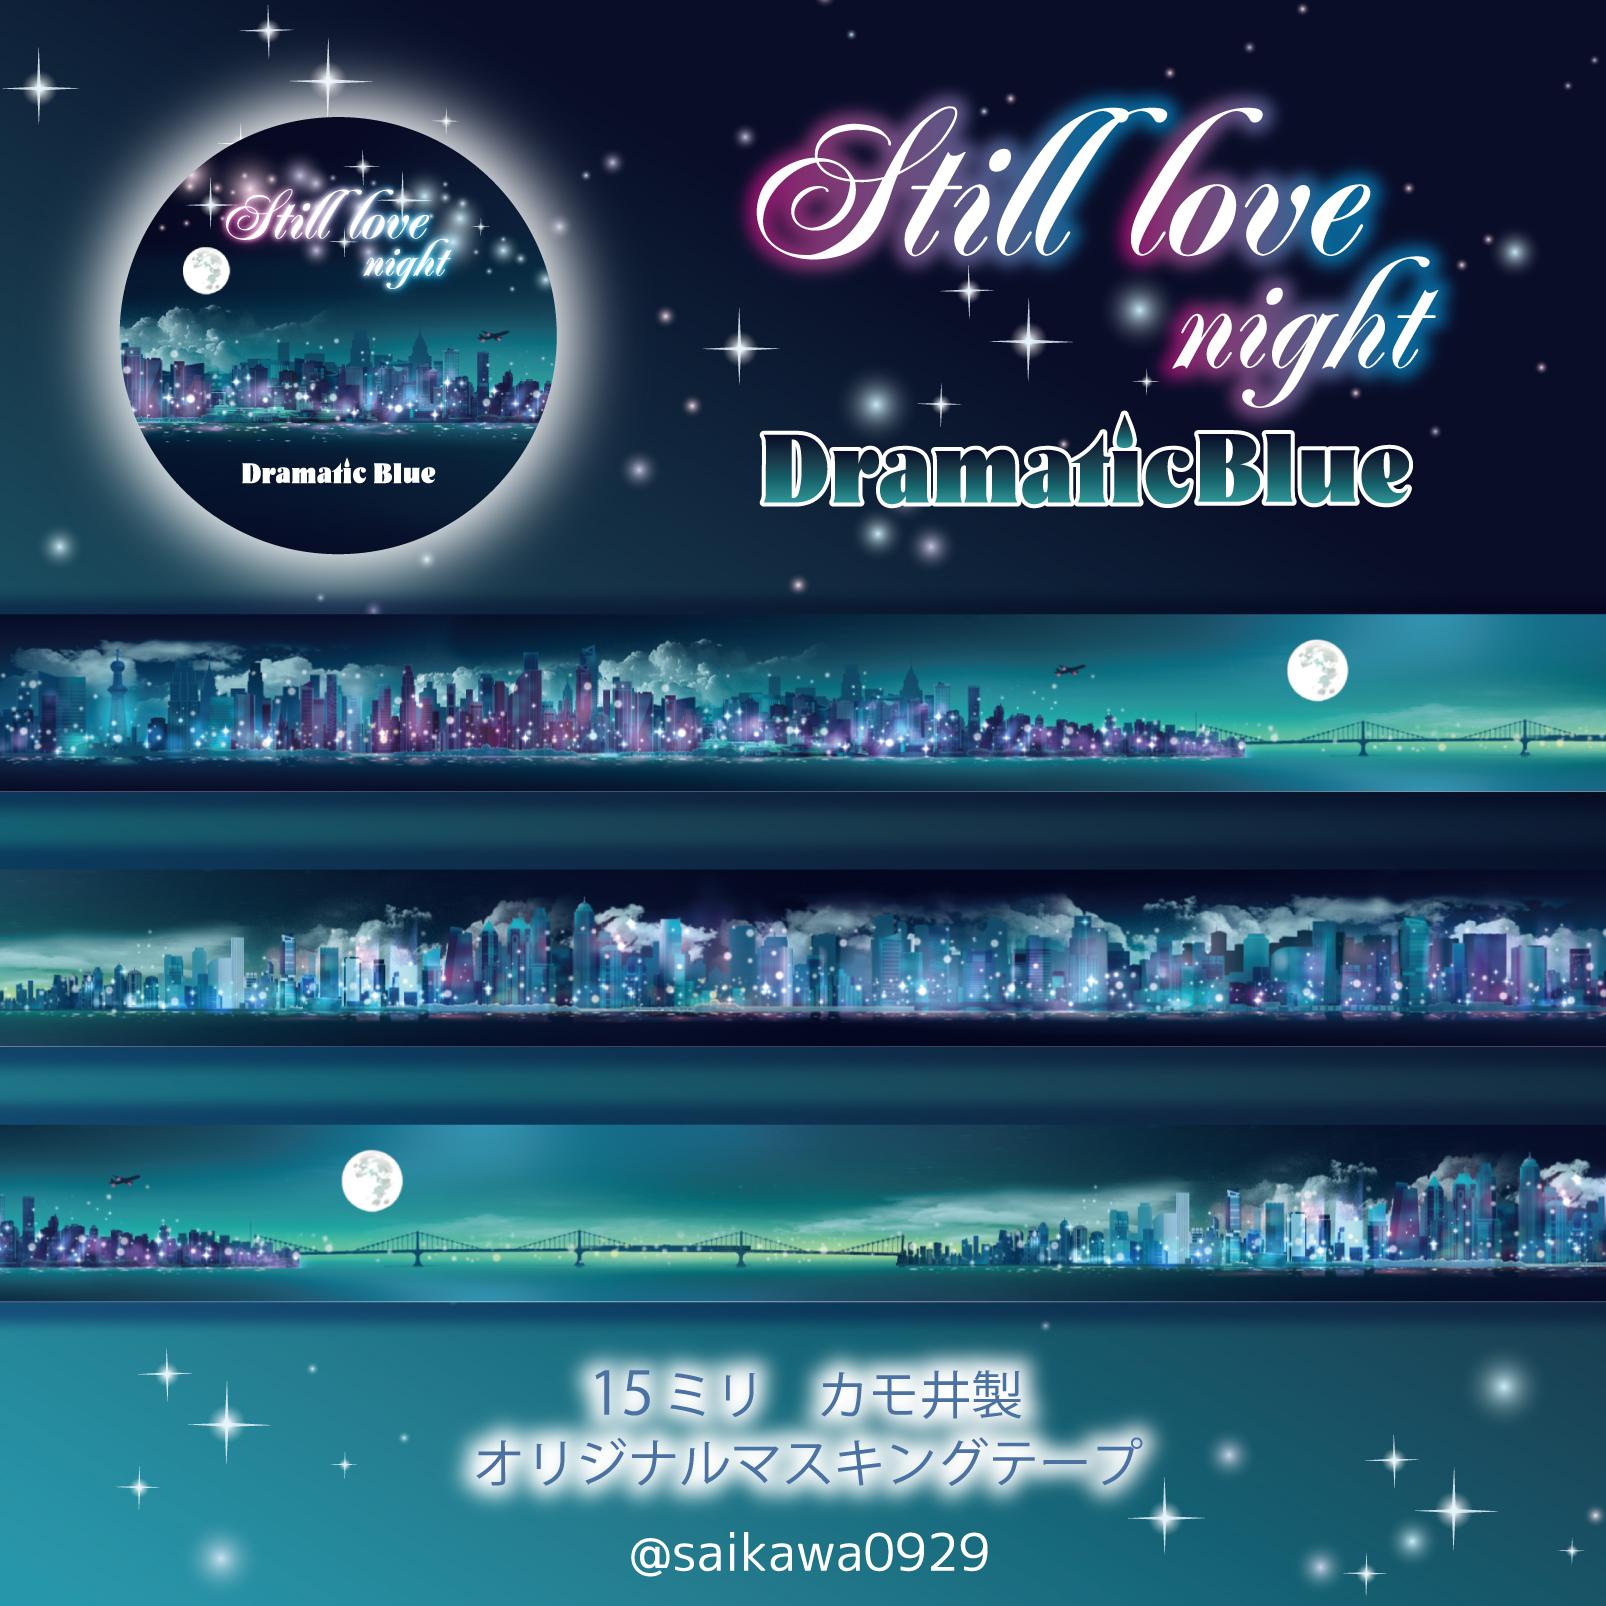 StillLove_night告知画像